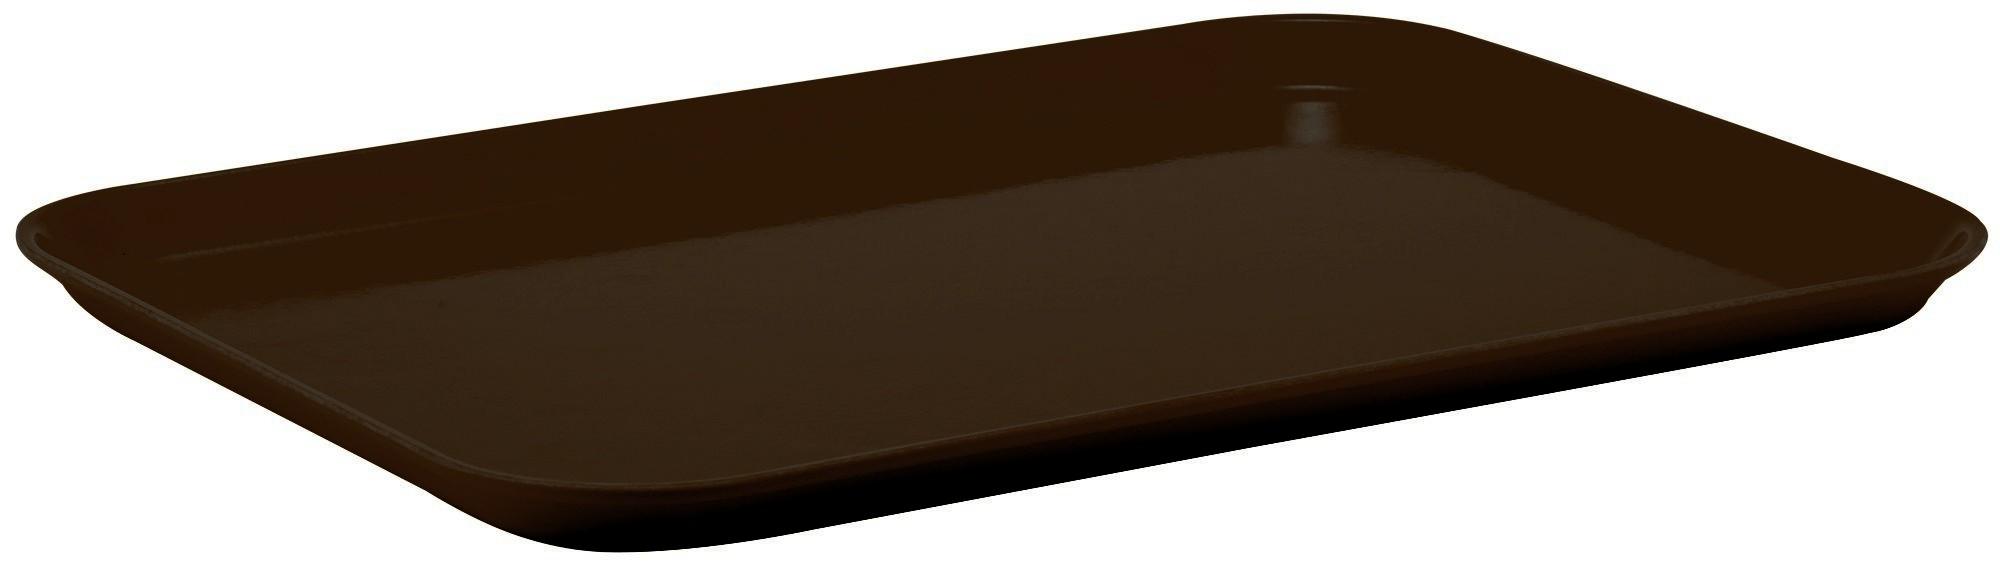 Winco FGT-1418B Fiberglass Rectangular Tray, Brown, 14quot; x 18quot;